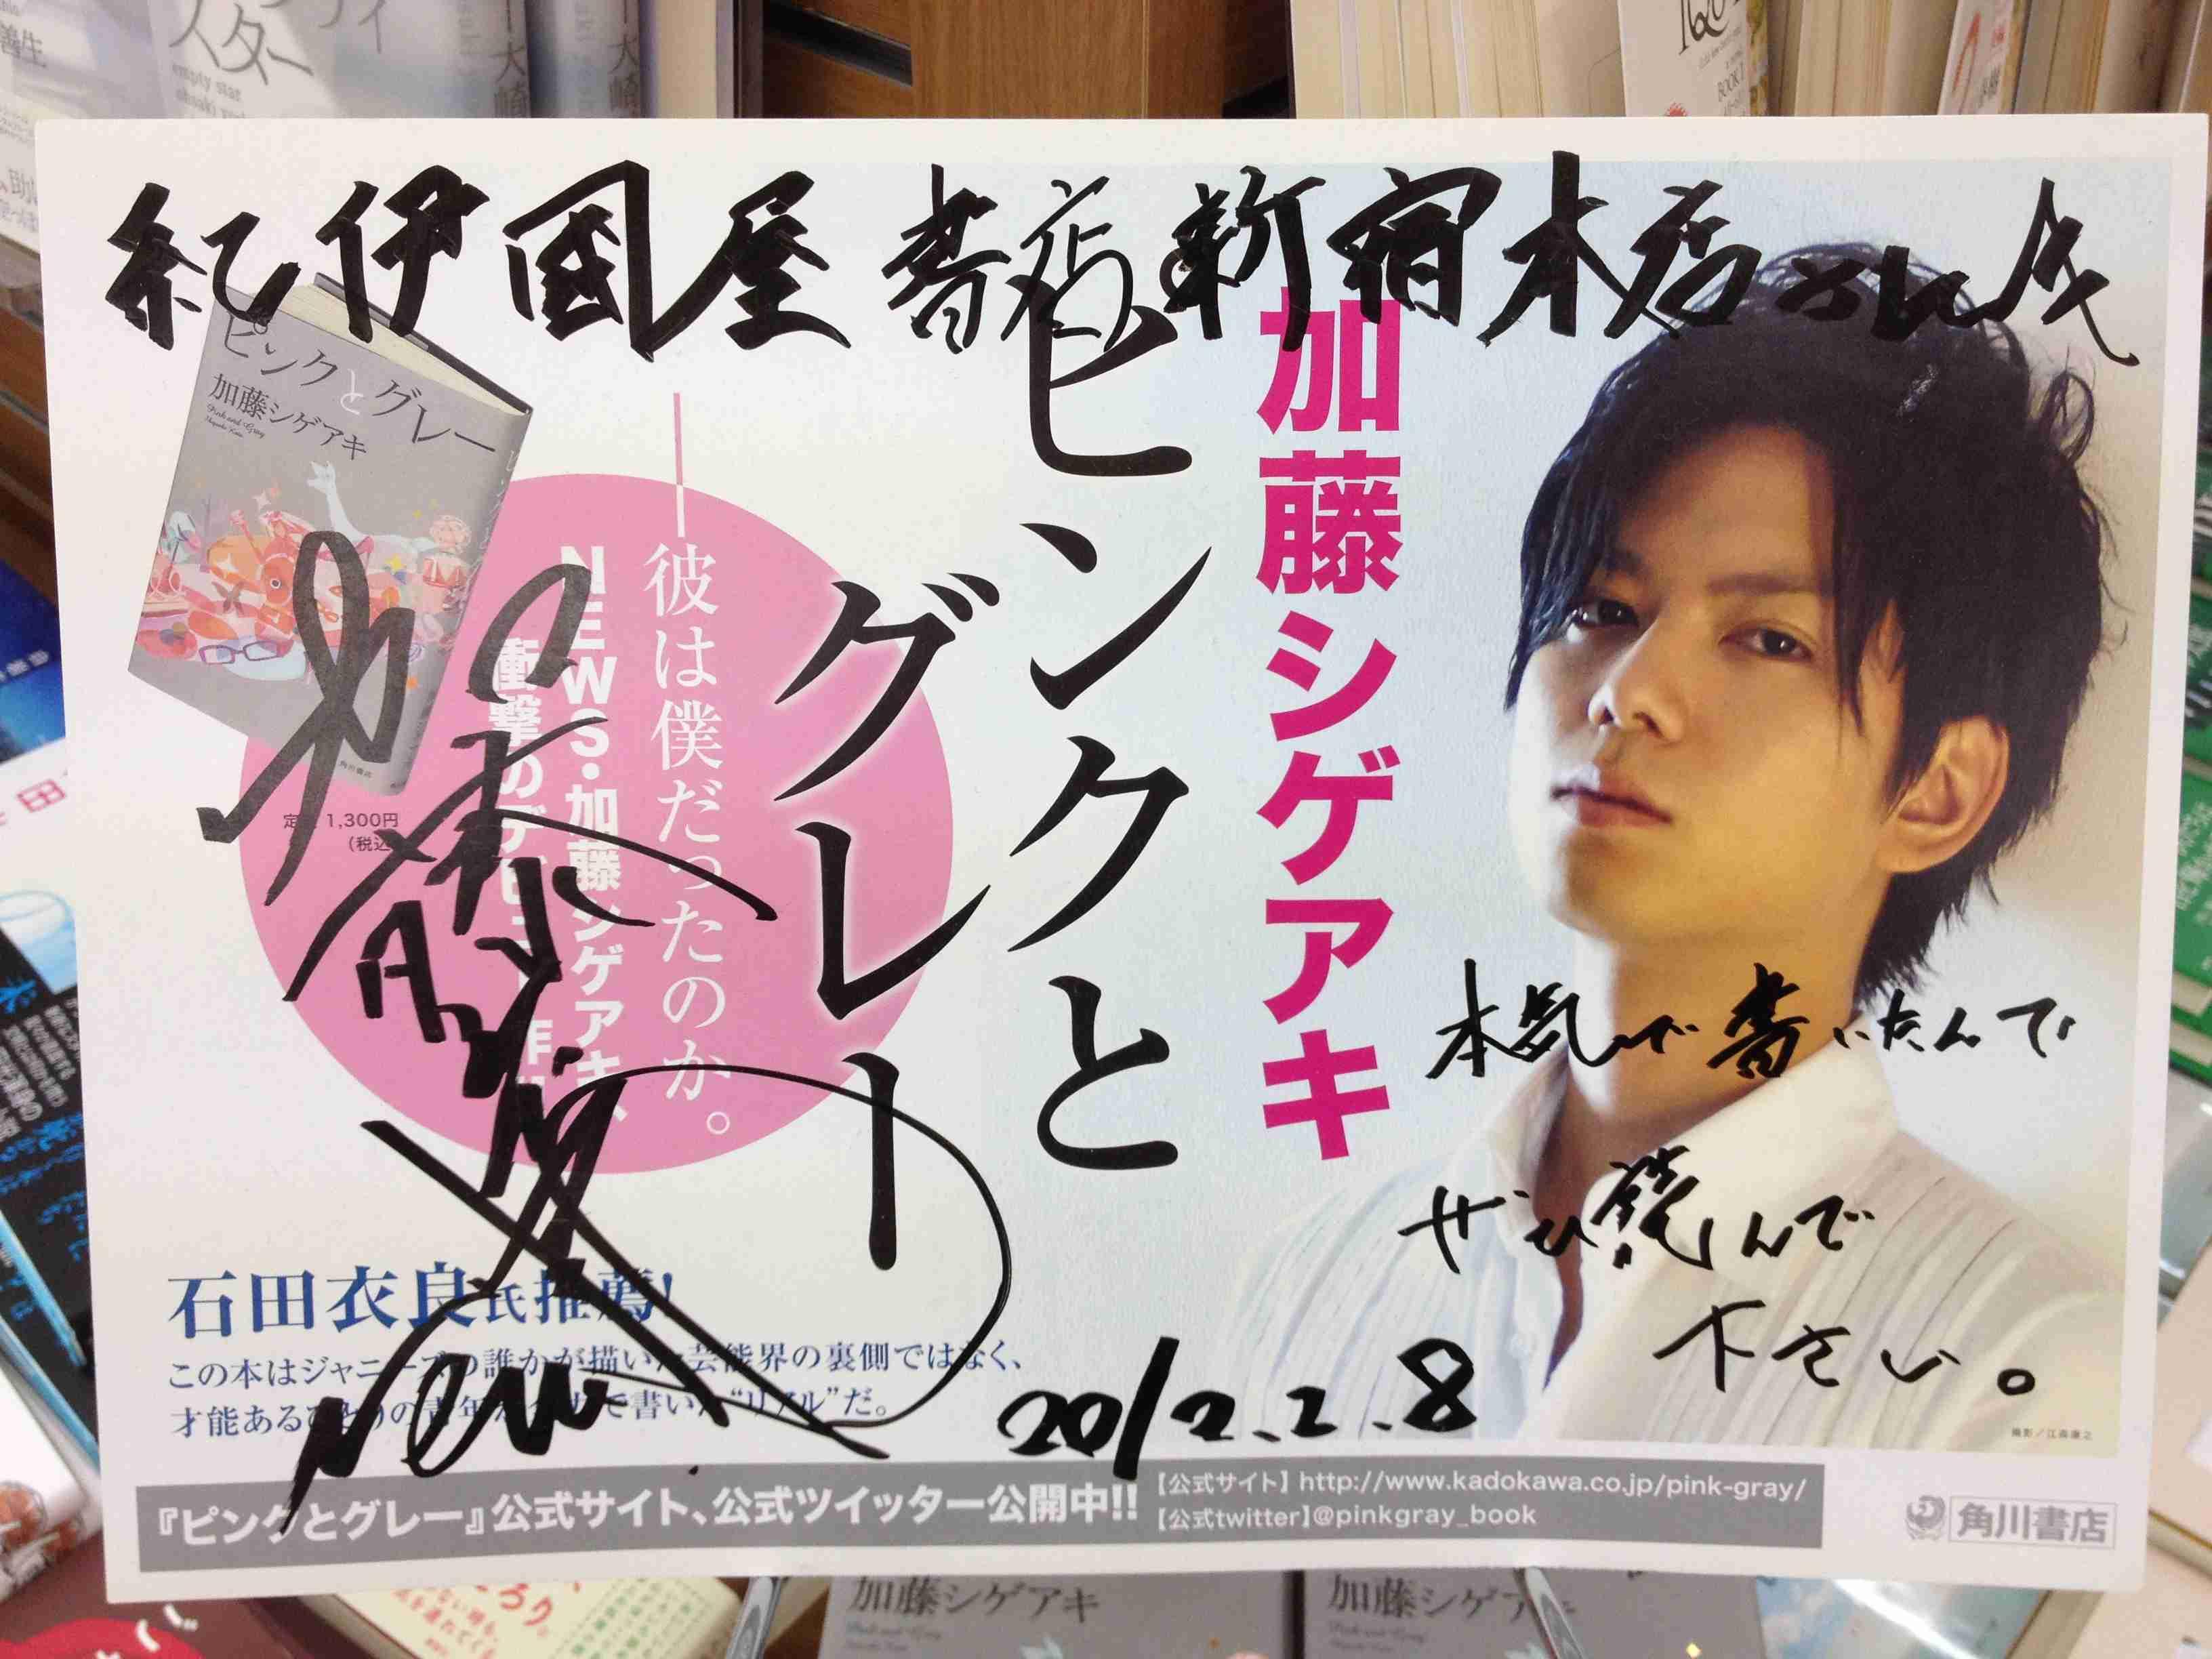 NEWS加藤シゲアキ 小説3作目「Burn.−バーン−」発表、自分を投影